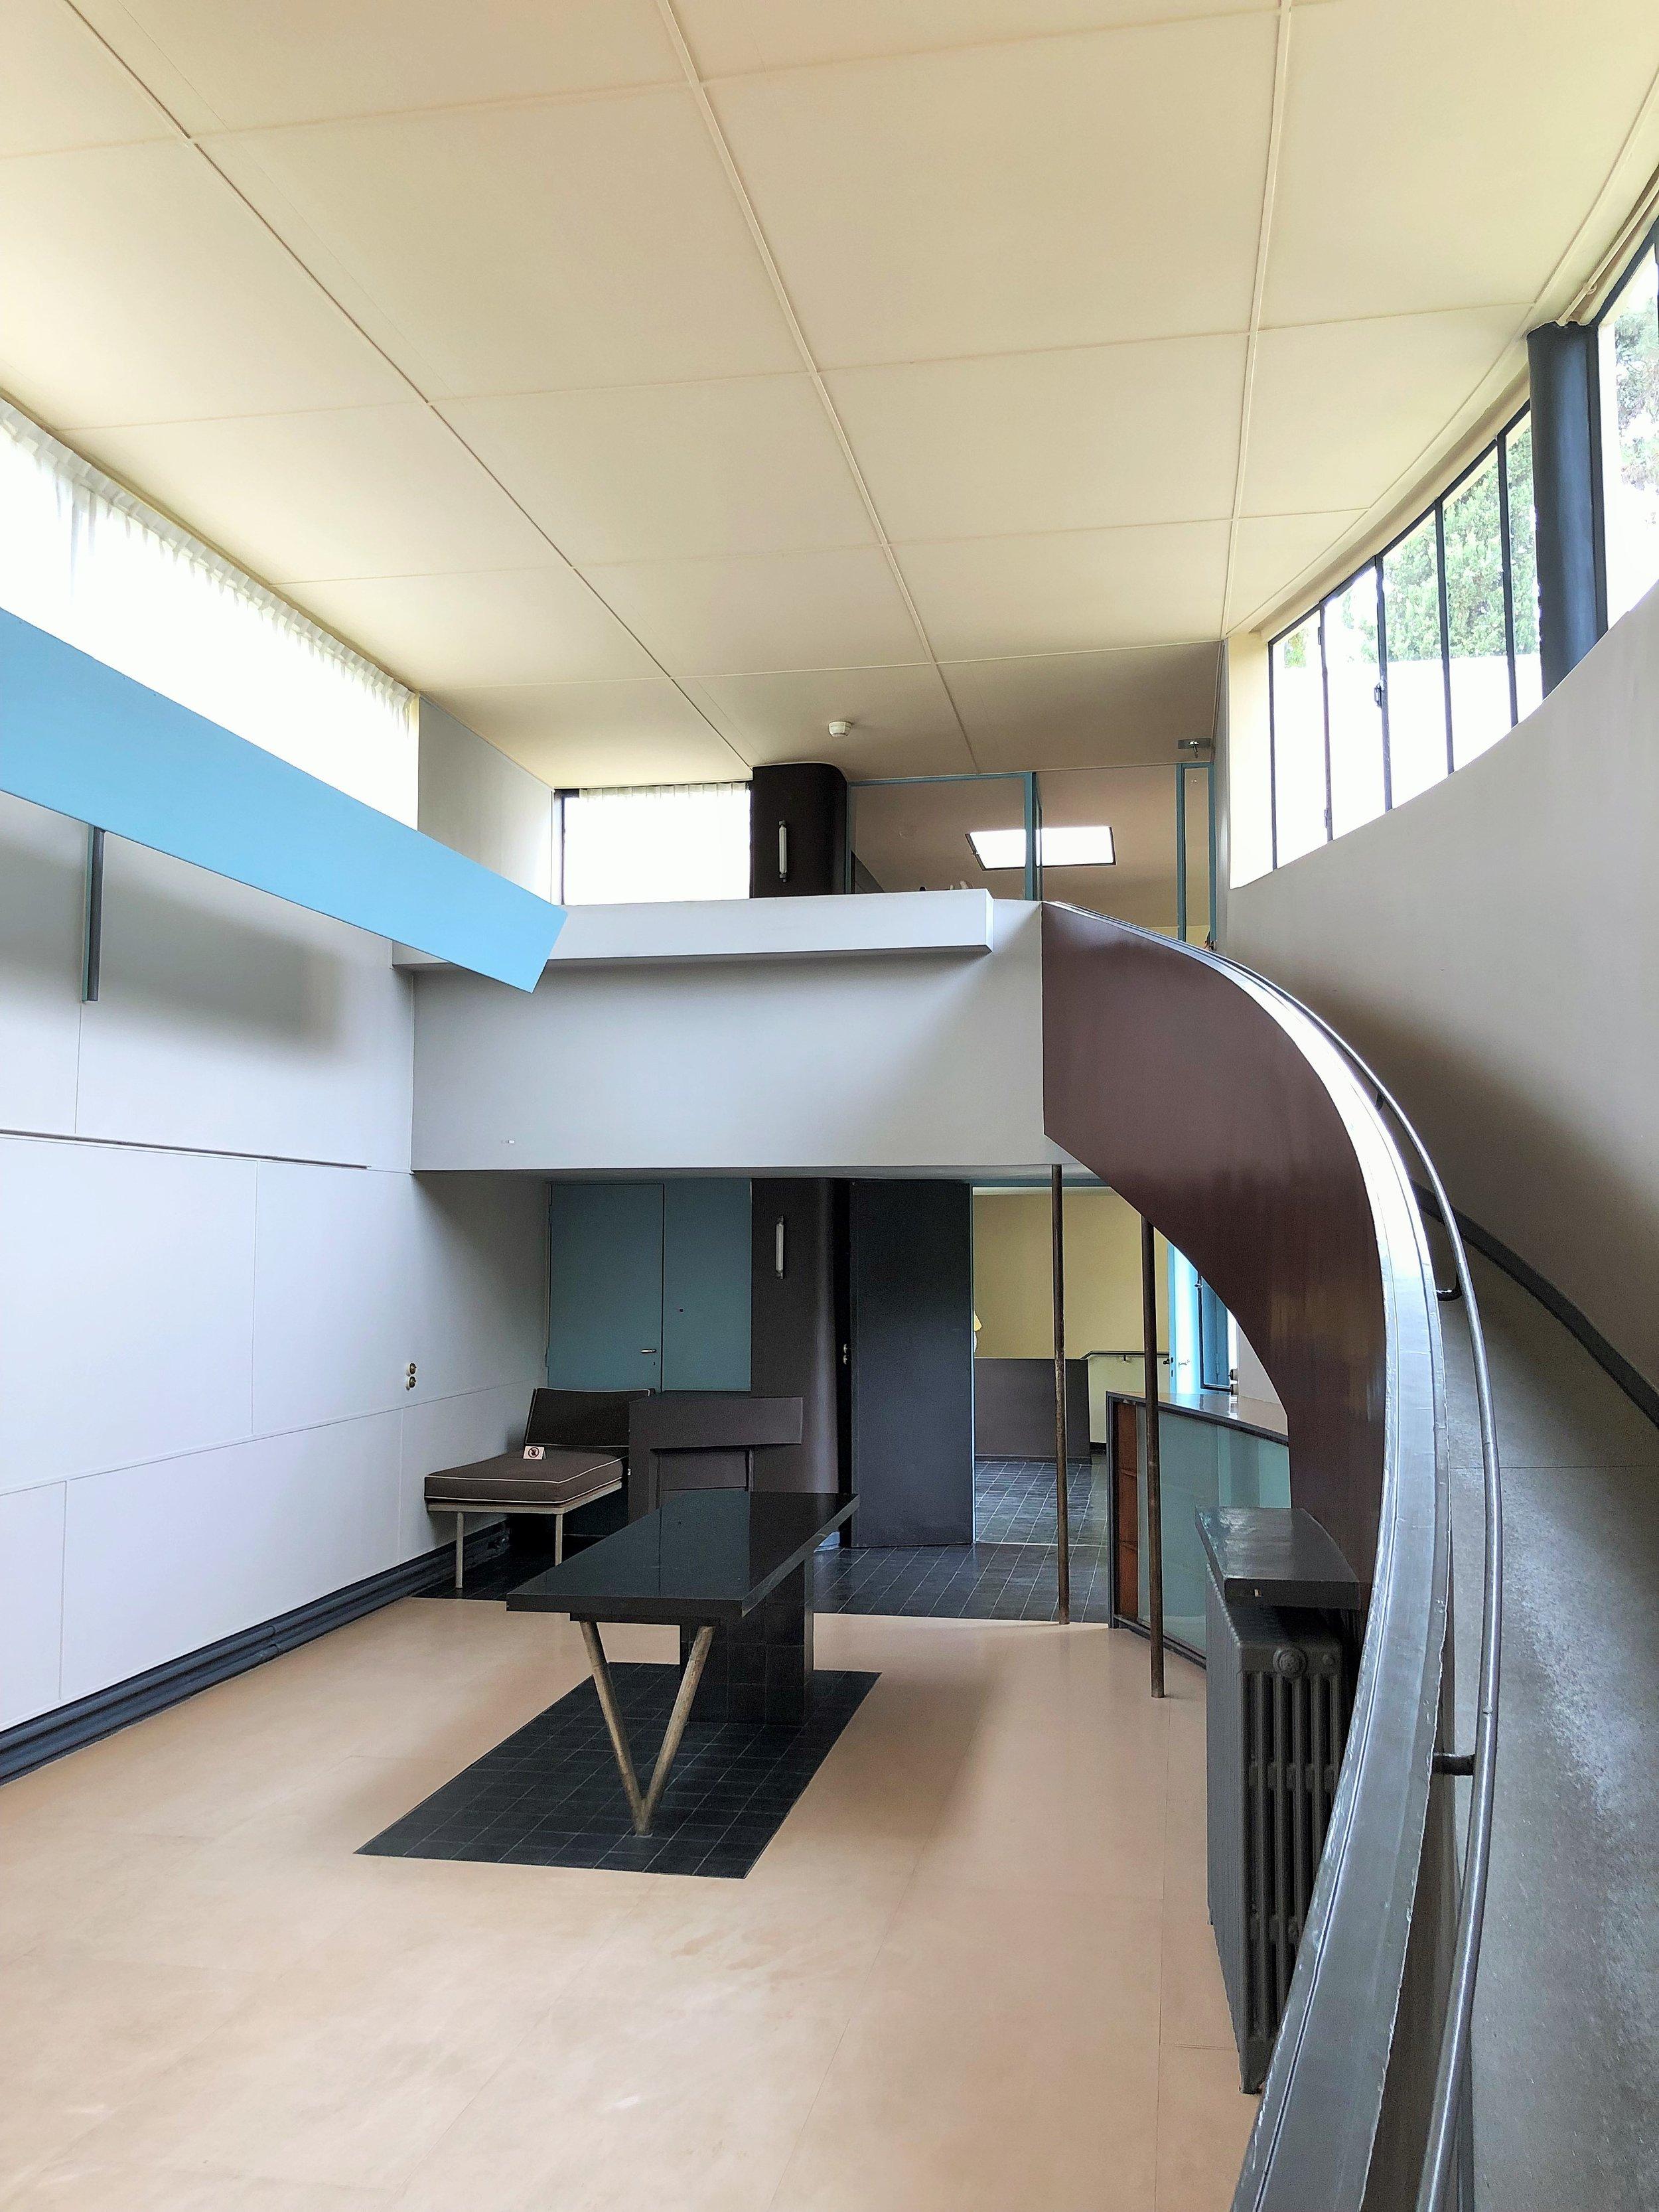 The gallery, Maison La Roche, by Le Corbusier Photograph ©The London List